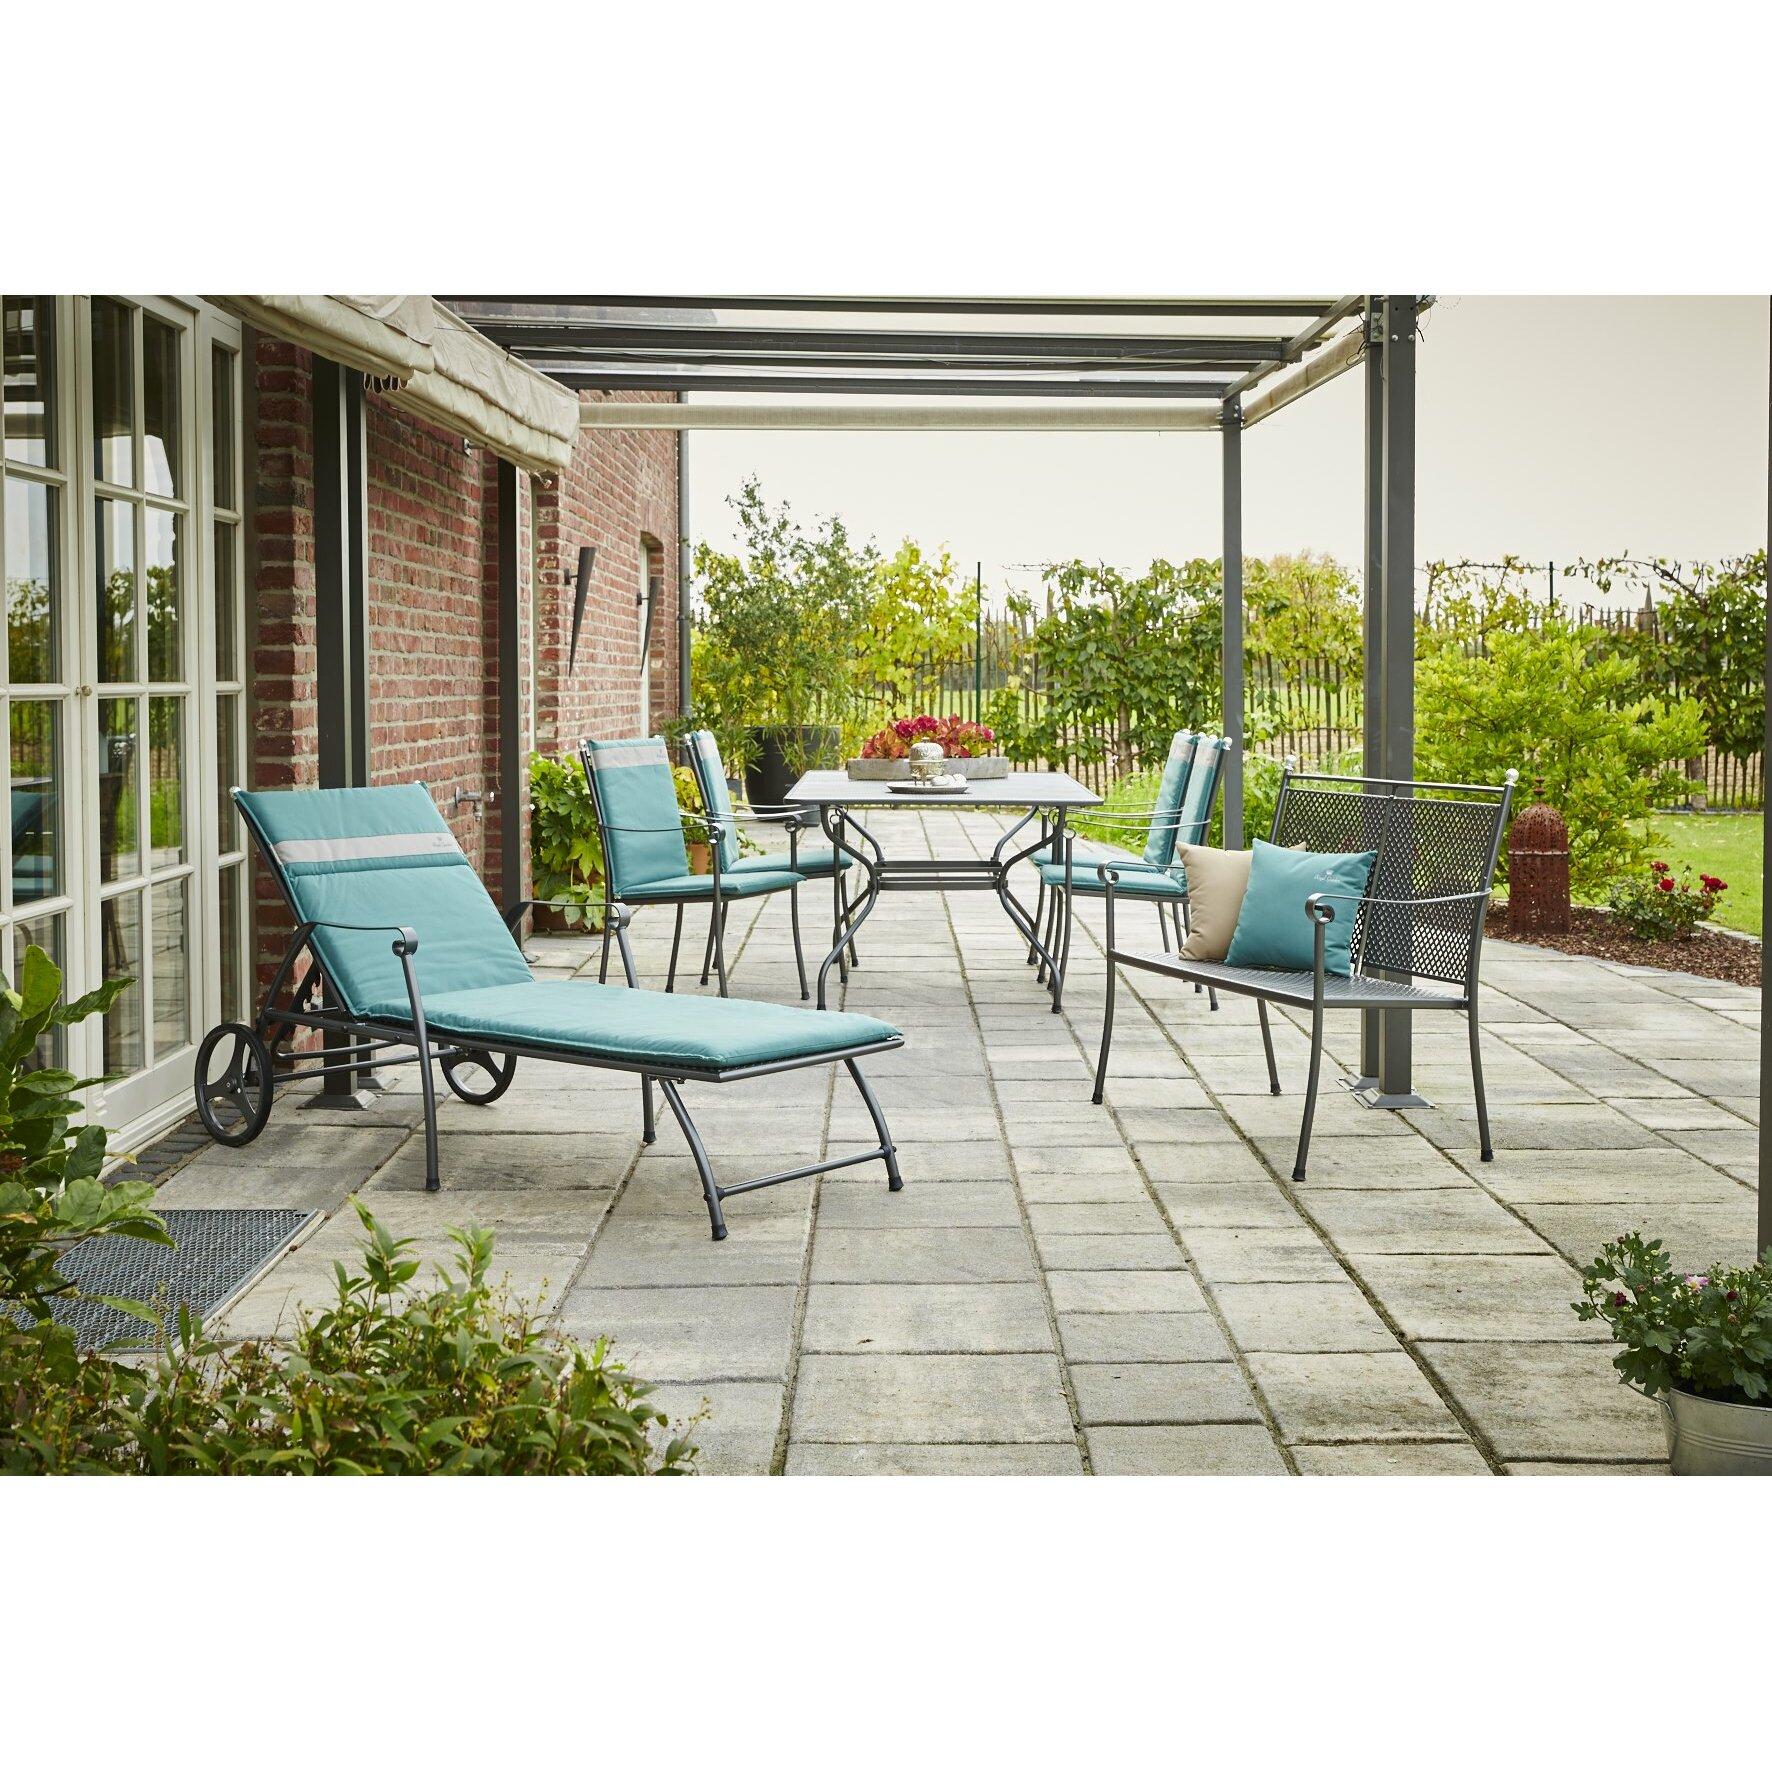 royal garden gartenliege excelsior bewertungen. Black Bedroom Furniture Sets. Home Design Ideas